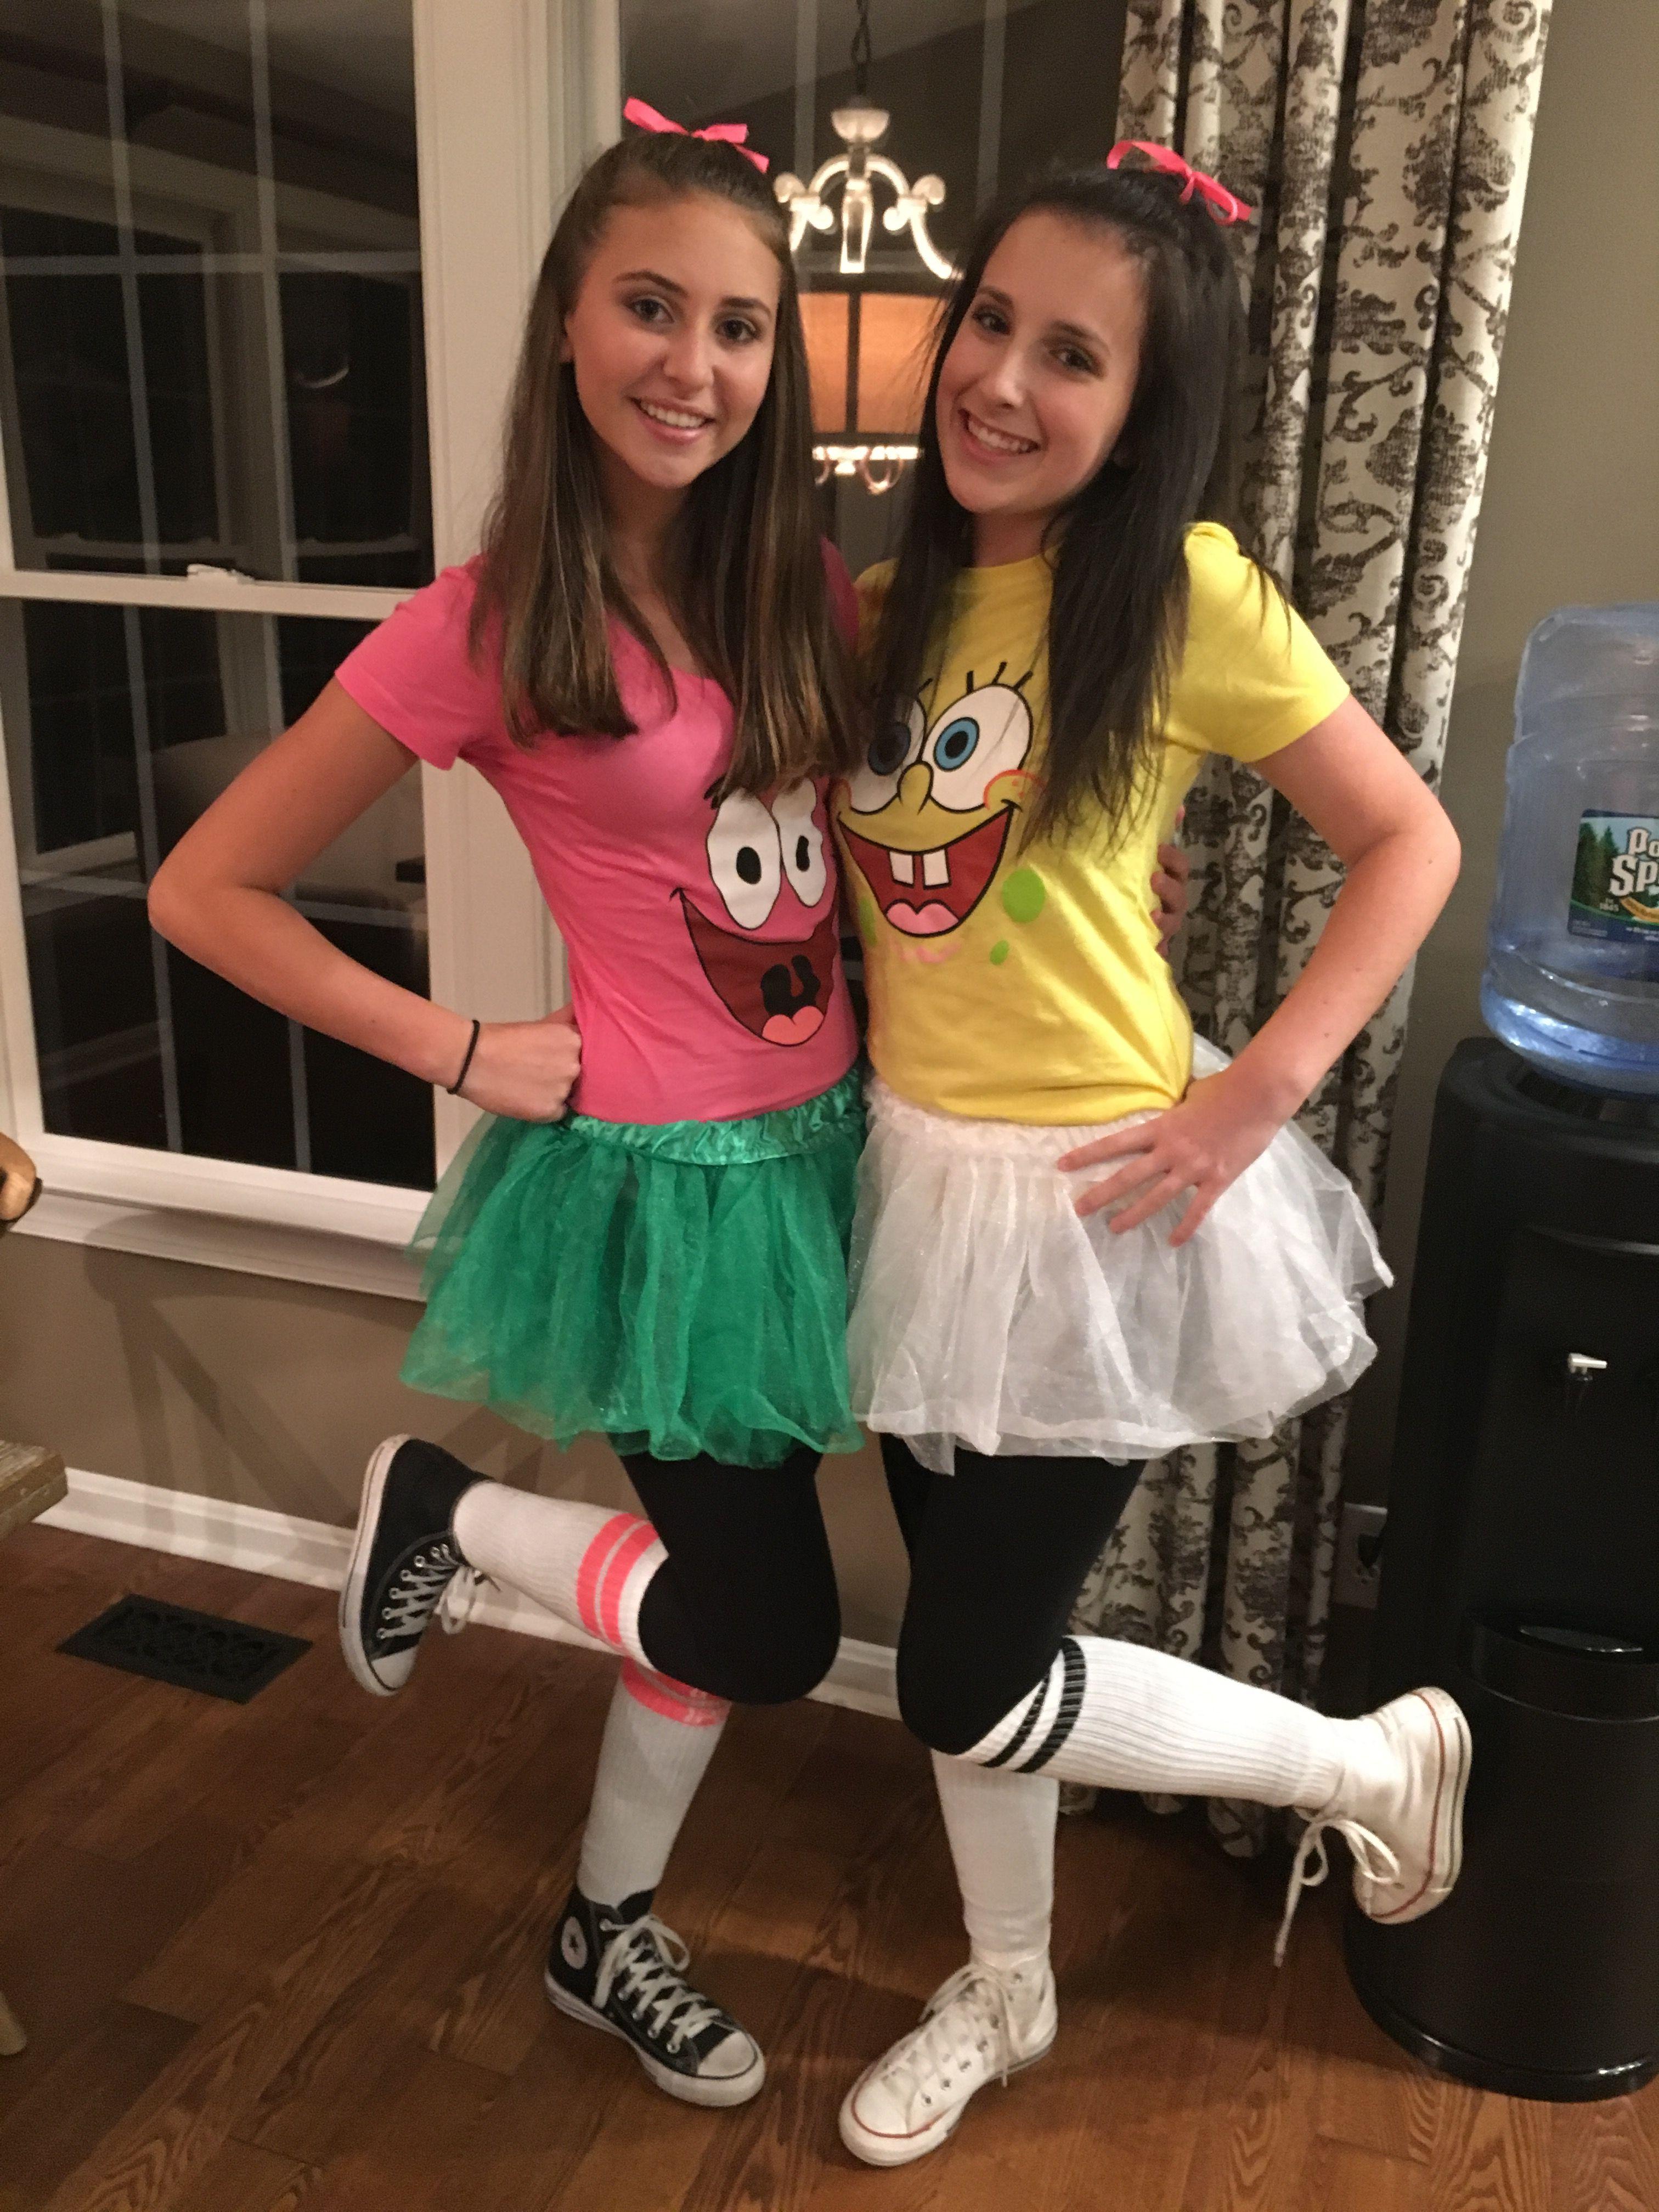 Duo Halloween Costume Ideas.Cute Partner Halloween Costumes Group Halloween Costumes